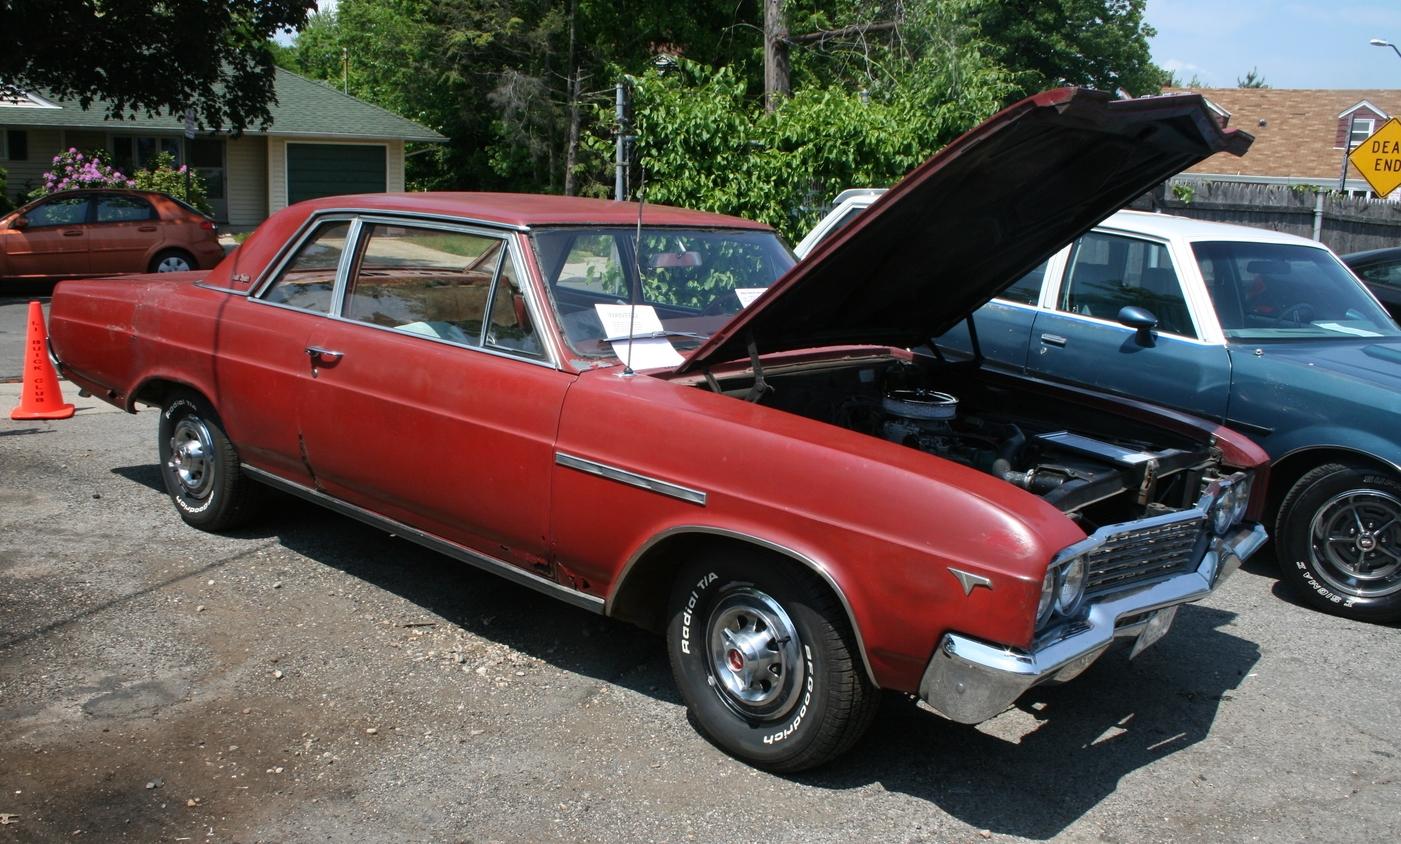 Tony & Karen Gatta: 1965 Skylark 2 Door Coupe